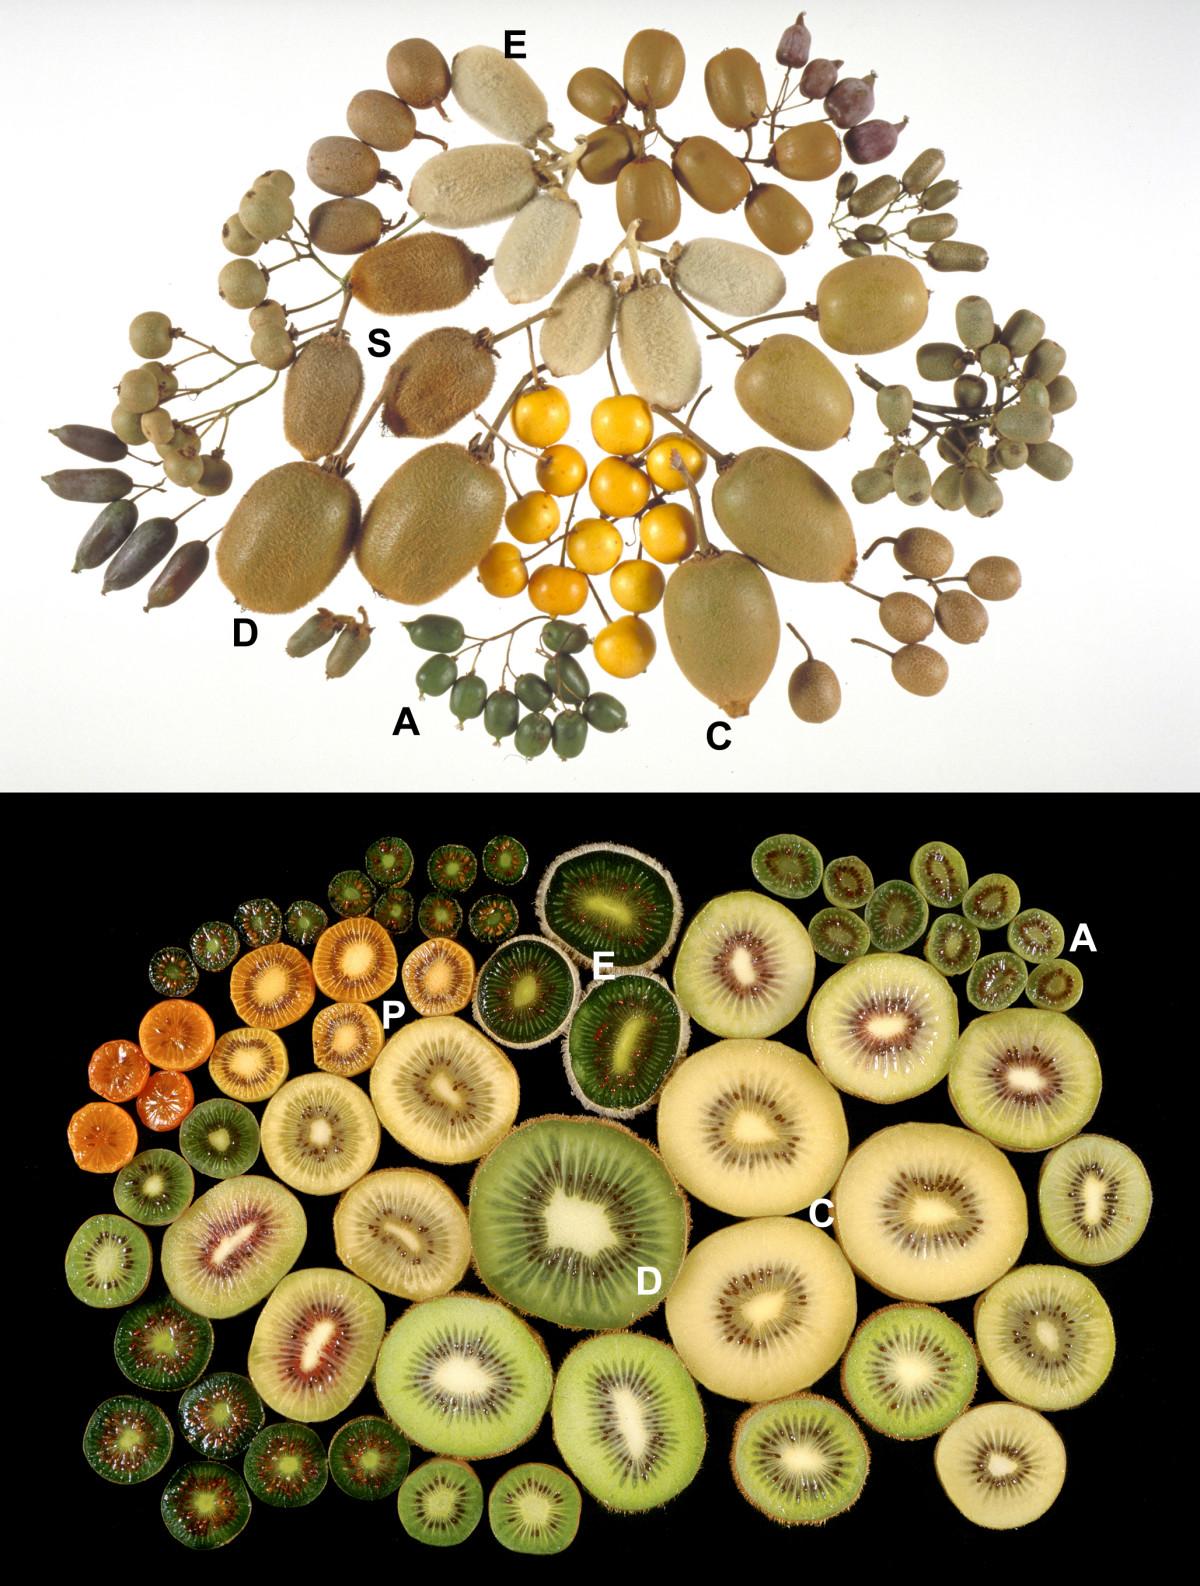 Kiwifruit by species A = A. arguta, C = A. chinensis, D = A. deliciosa, E = A. eriantha, I = A. indochinensis, P = A. polygama, S = A. setosa.